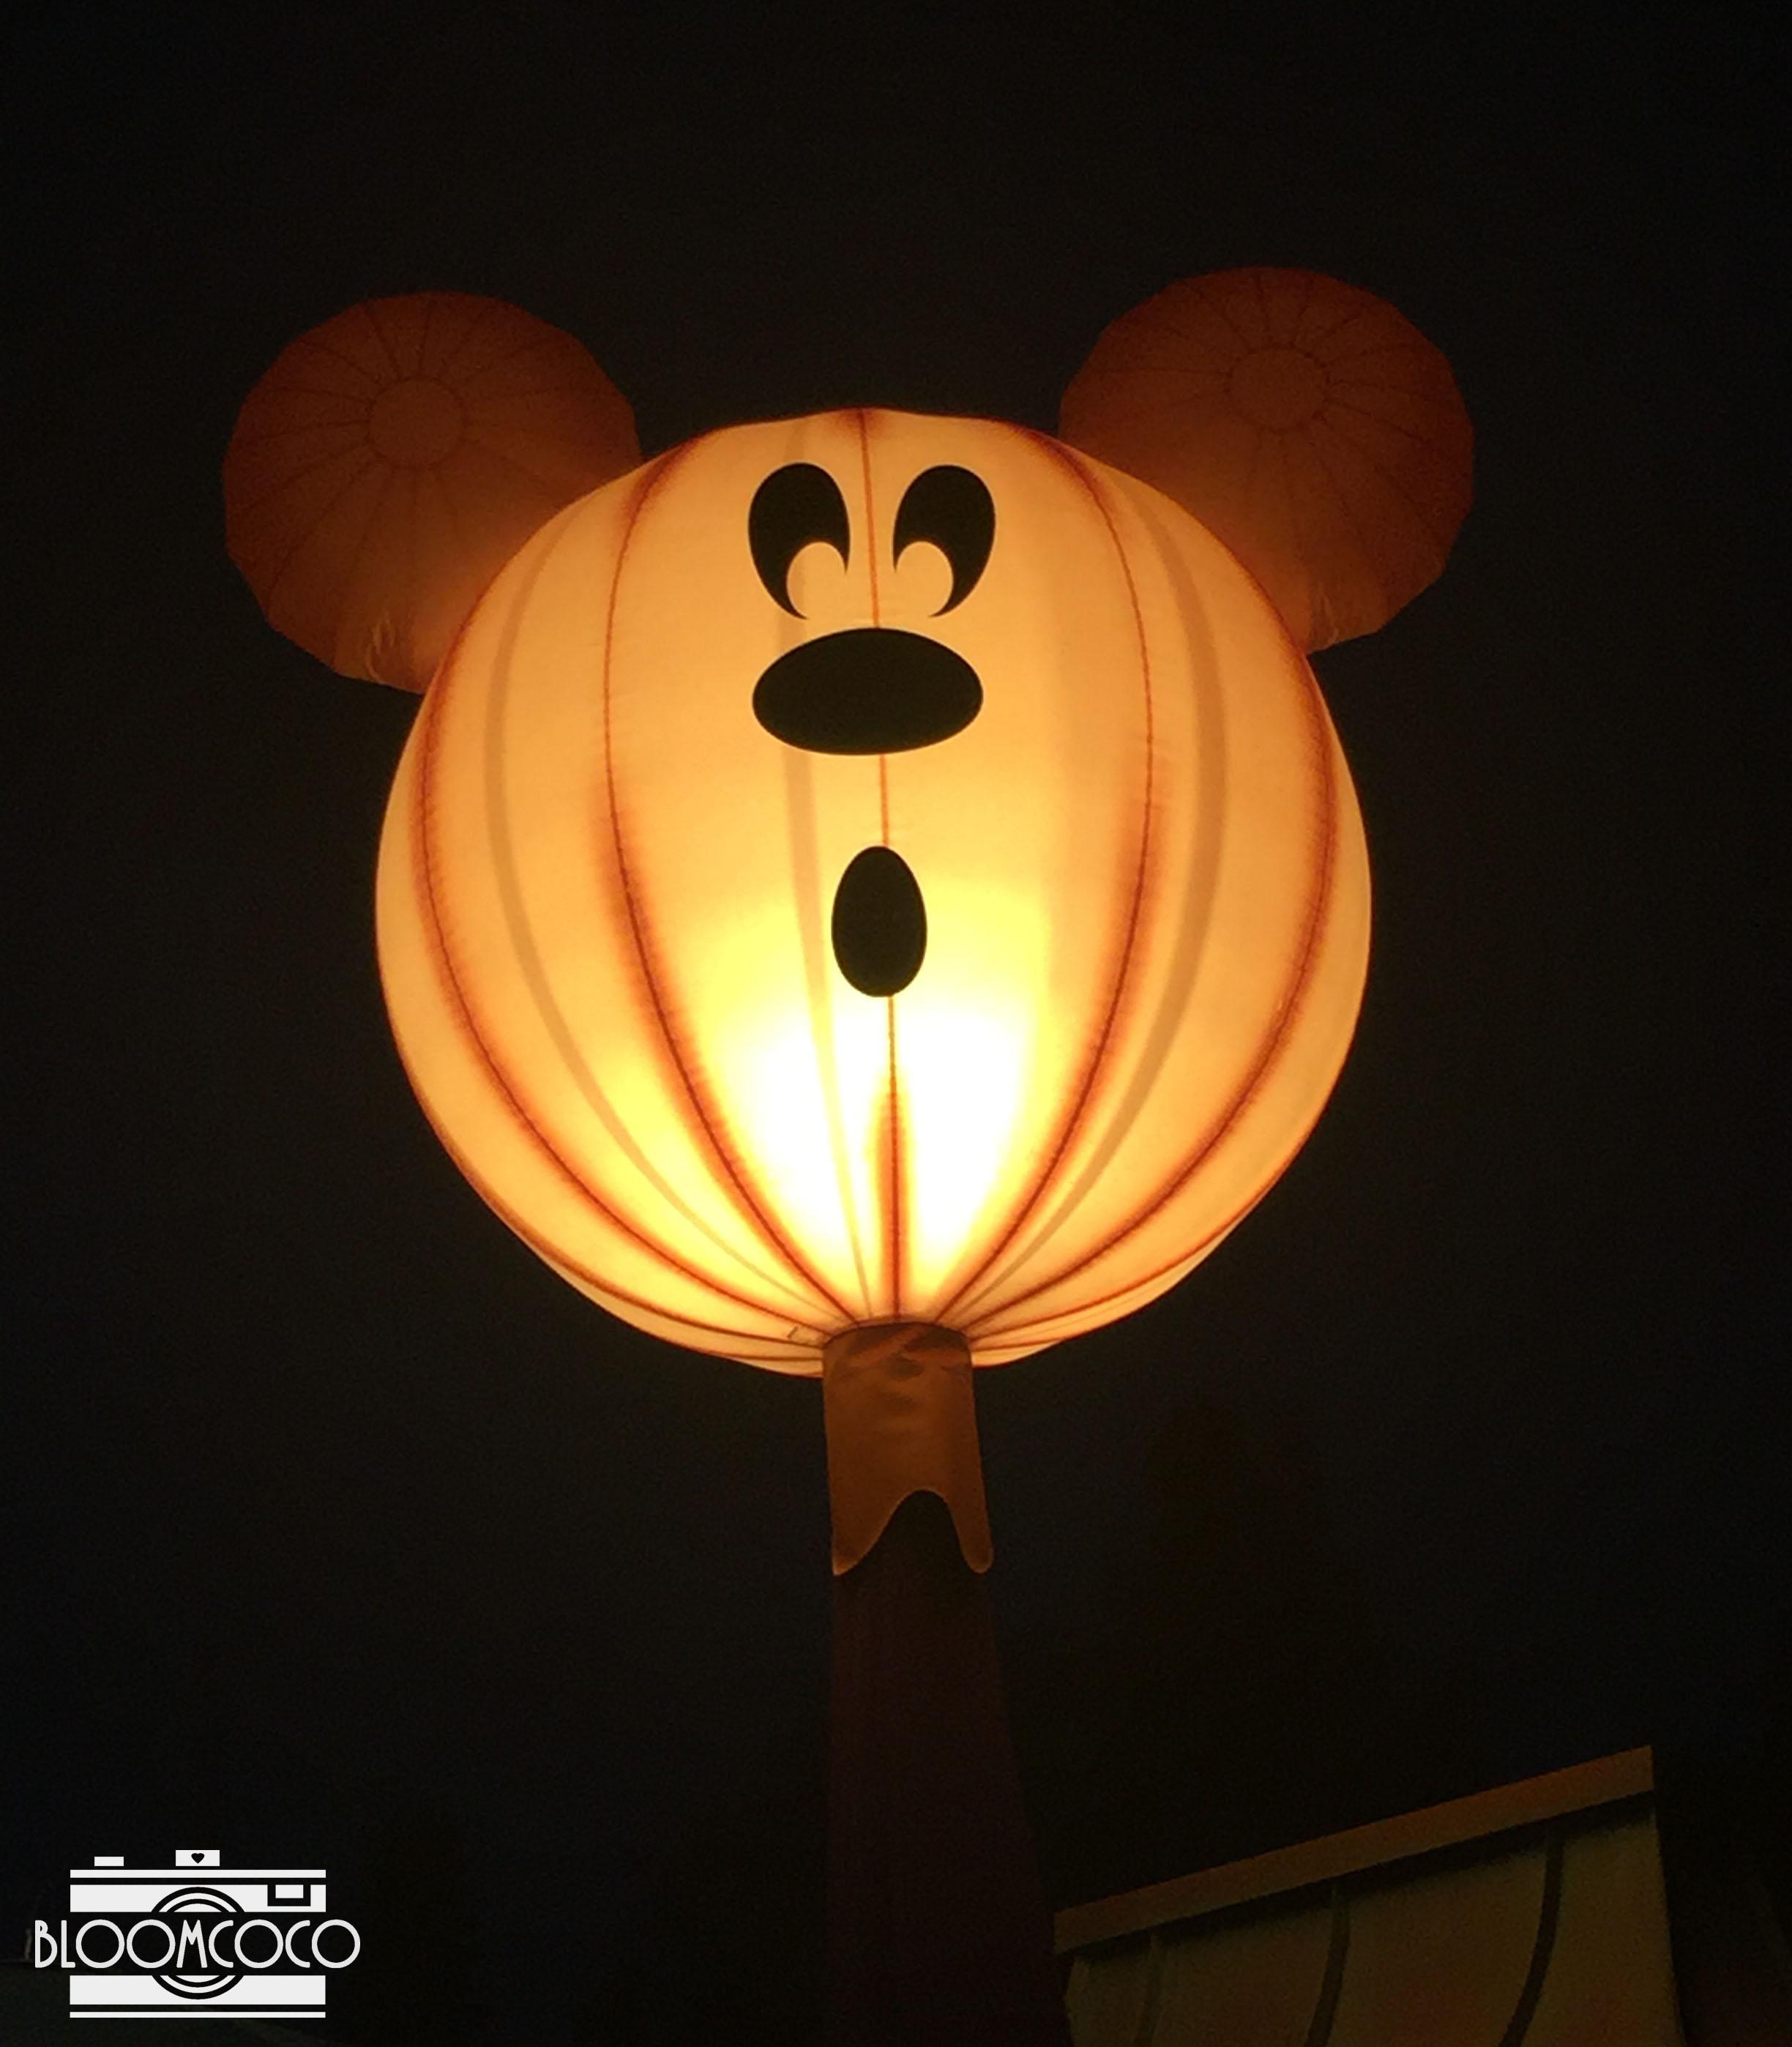 Disneyland Mickey